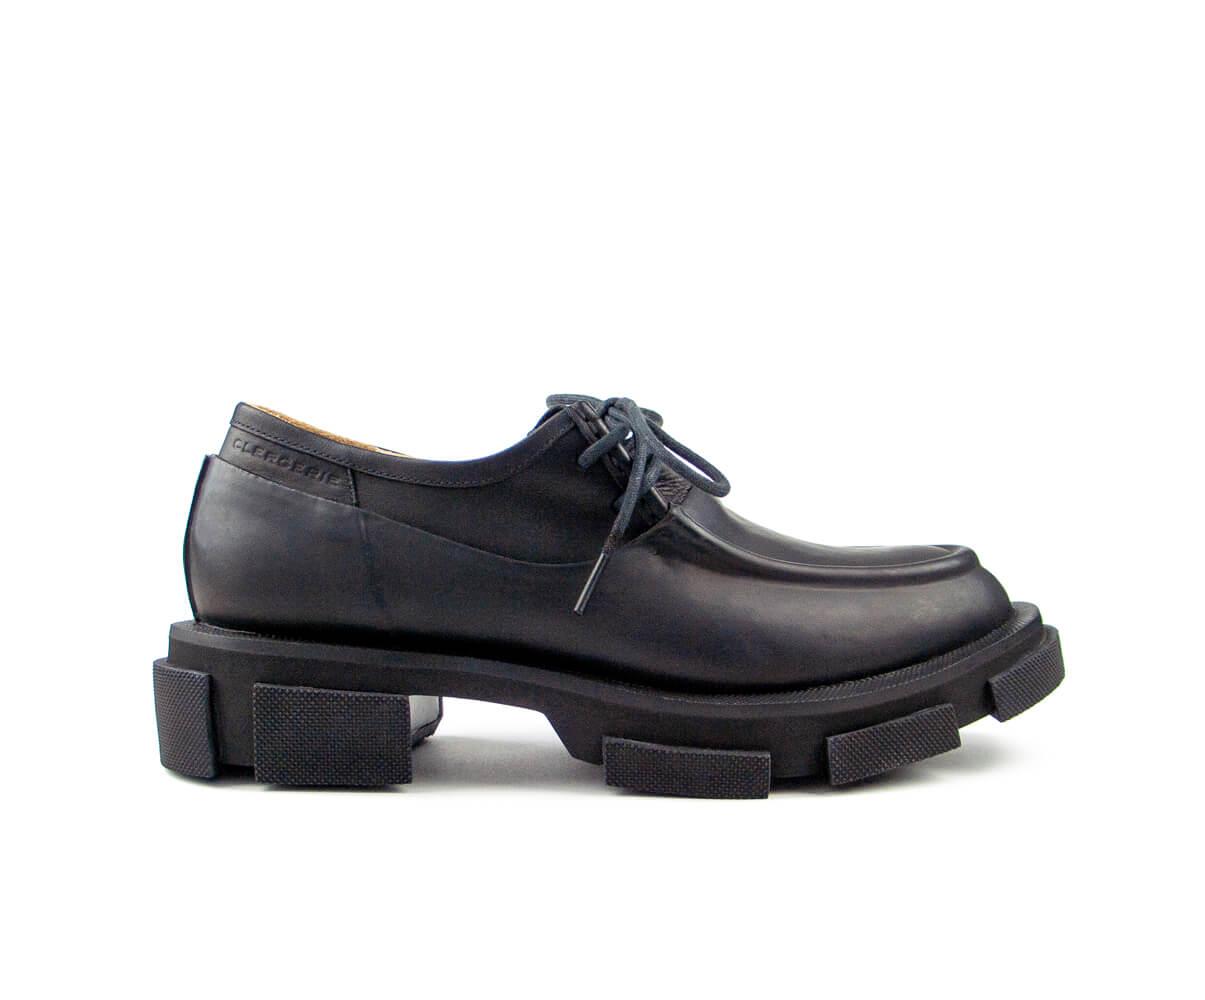 008 ecla scarpe rgb